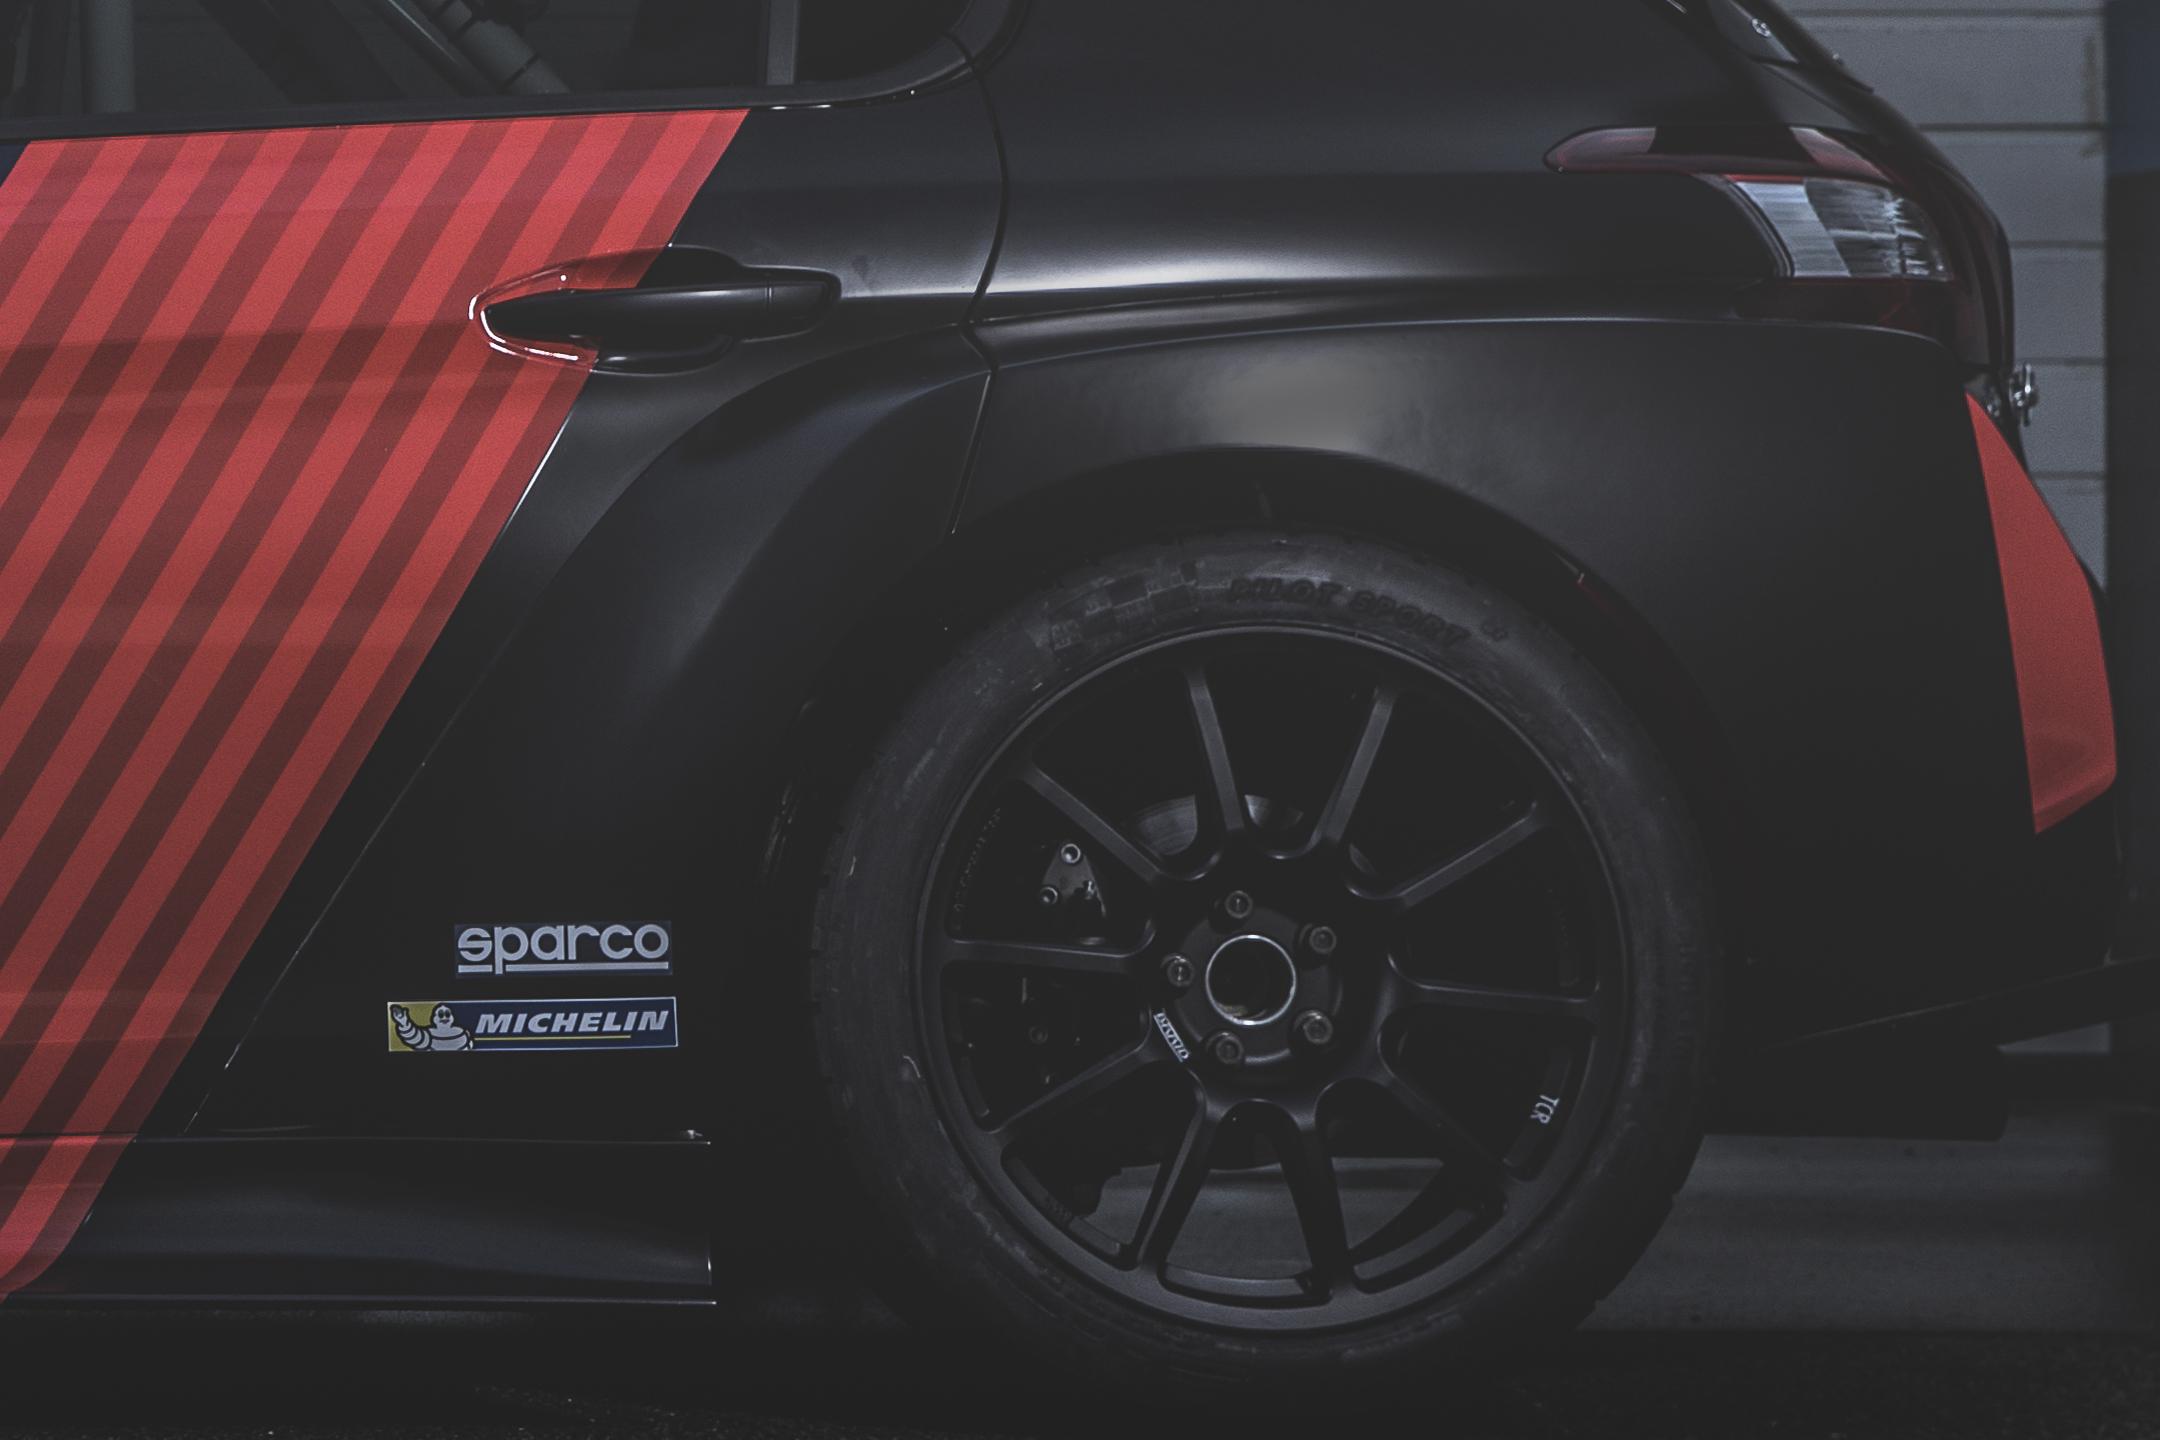 Peugeot 308TCR - 2018 - rear wheel / jante arrière